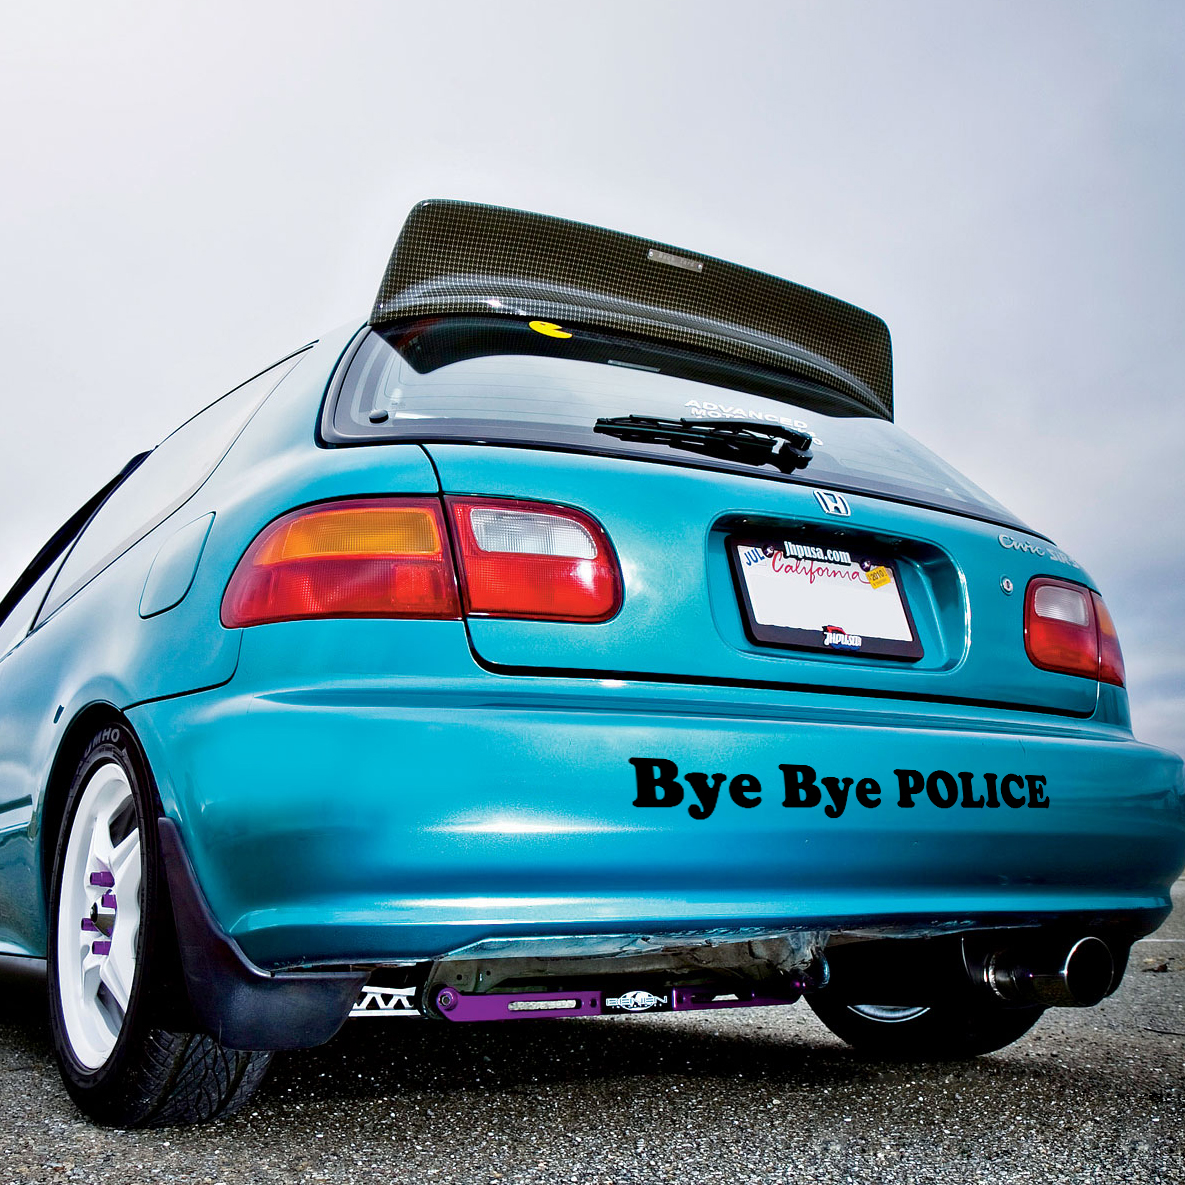 Bye bye police banner loop door osaka jdm kanjo performance kanjozoku honda racing civic ek eg car vinyl sticker decal